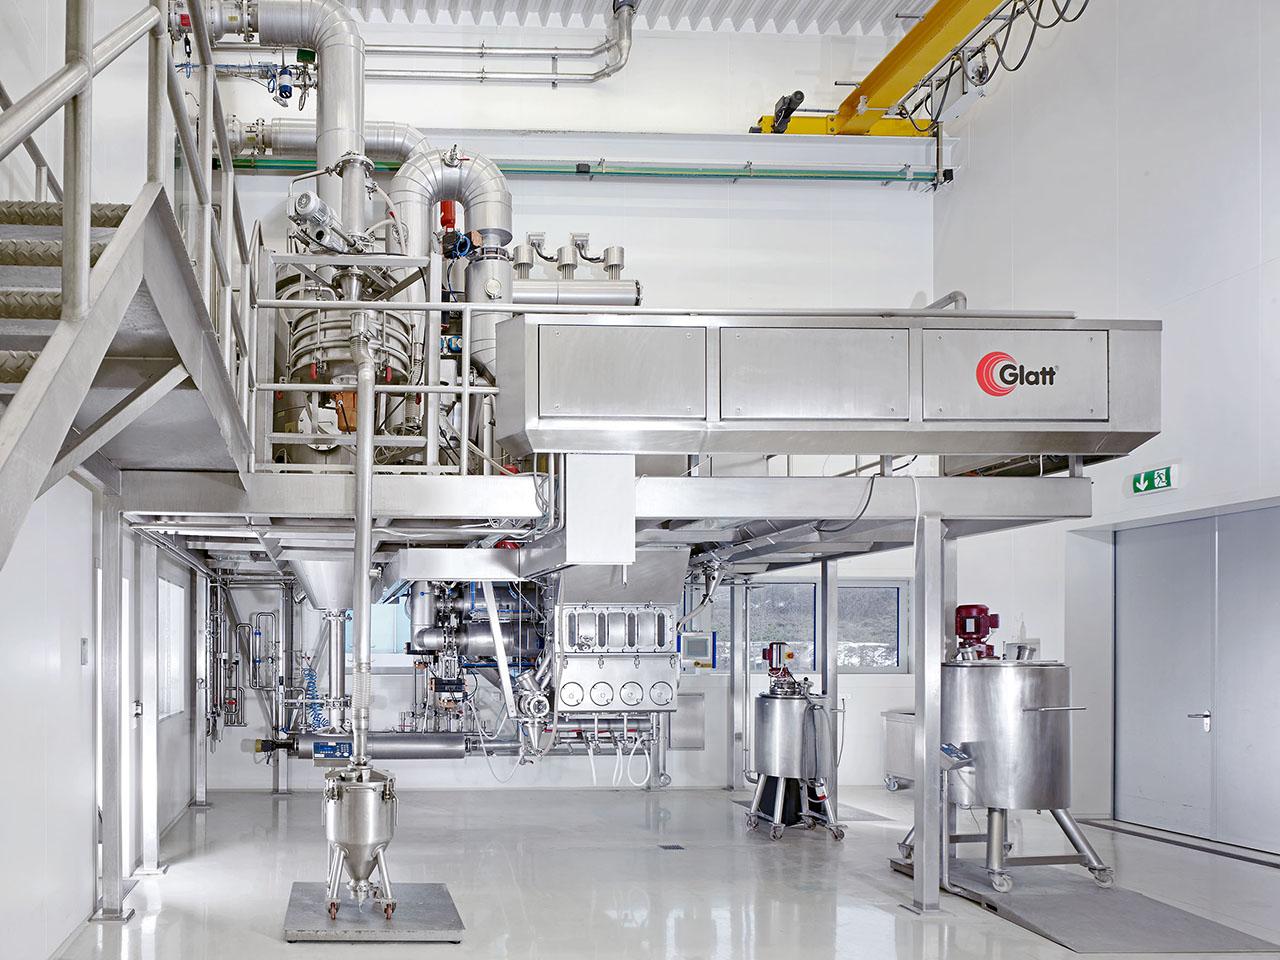 Glatt modular pilot plant ProCell PilotSystem